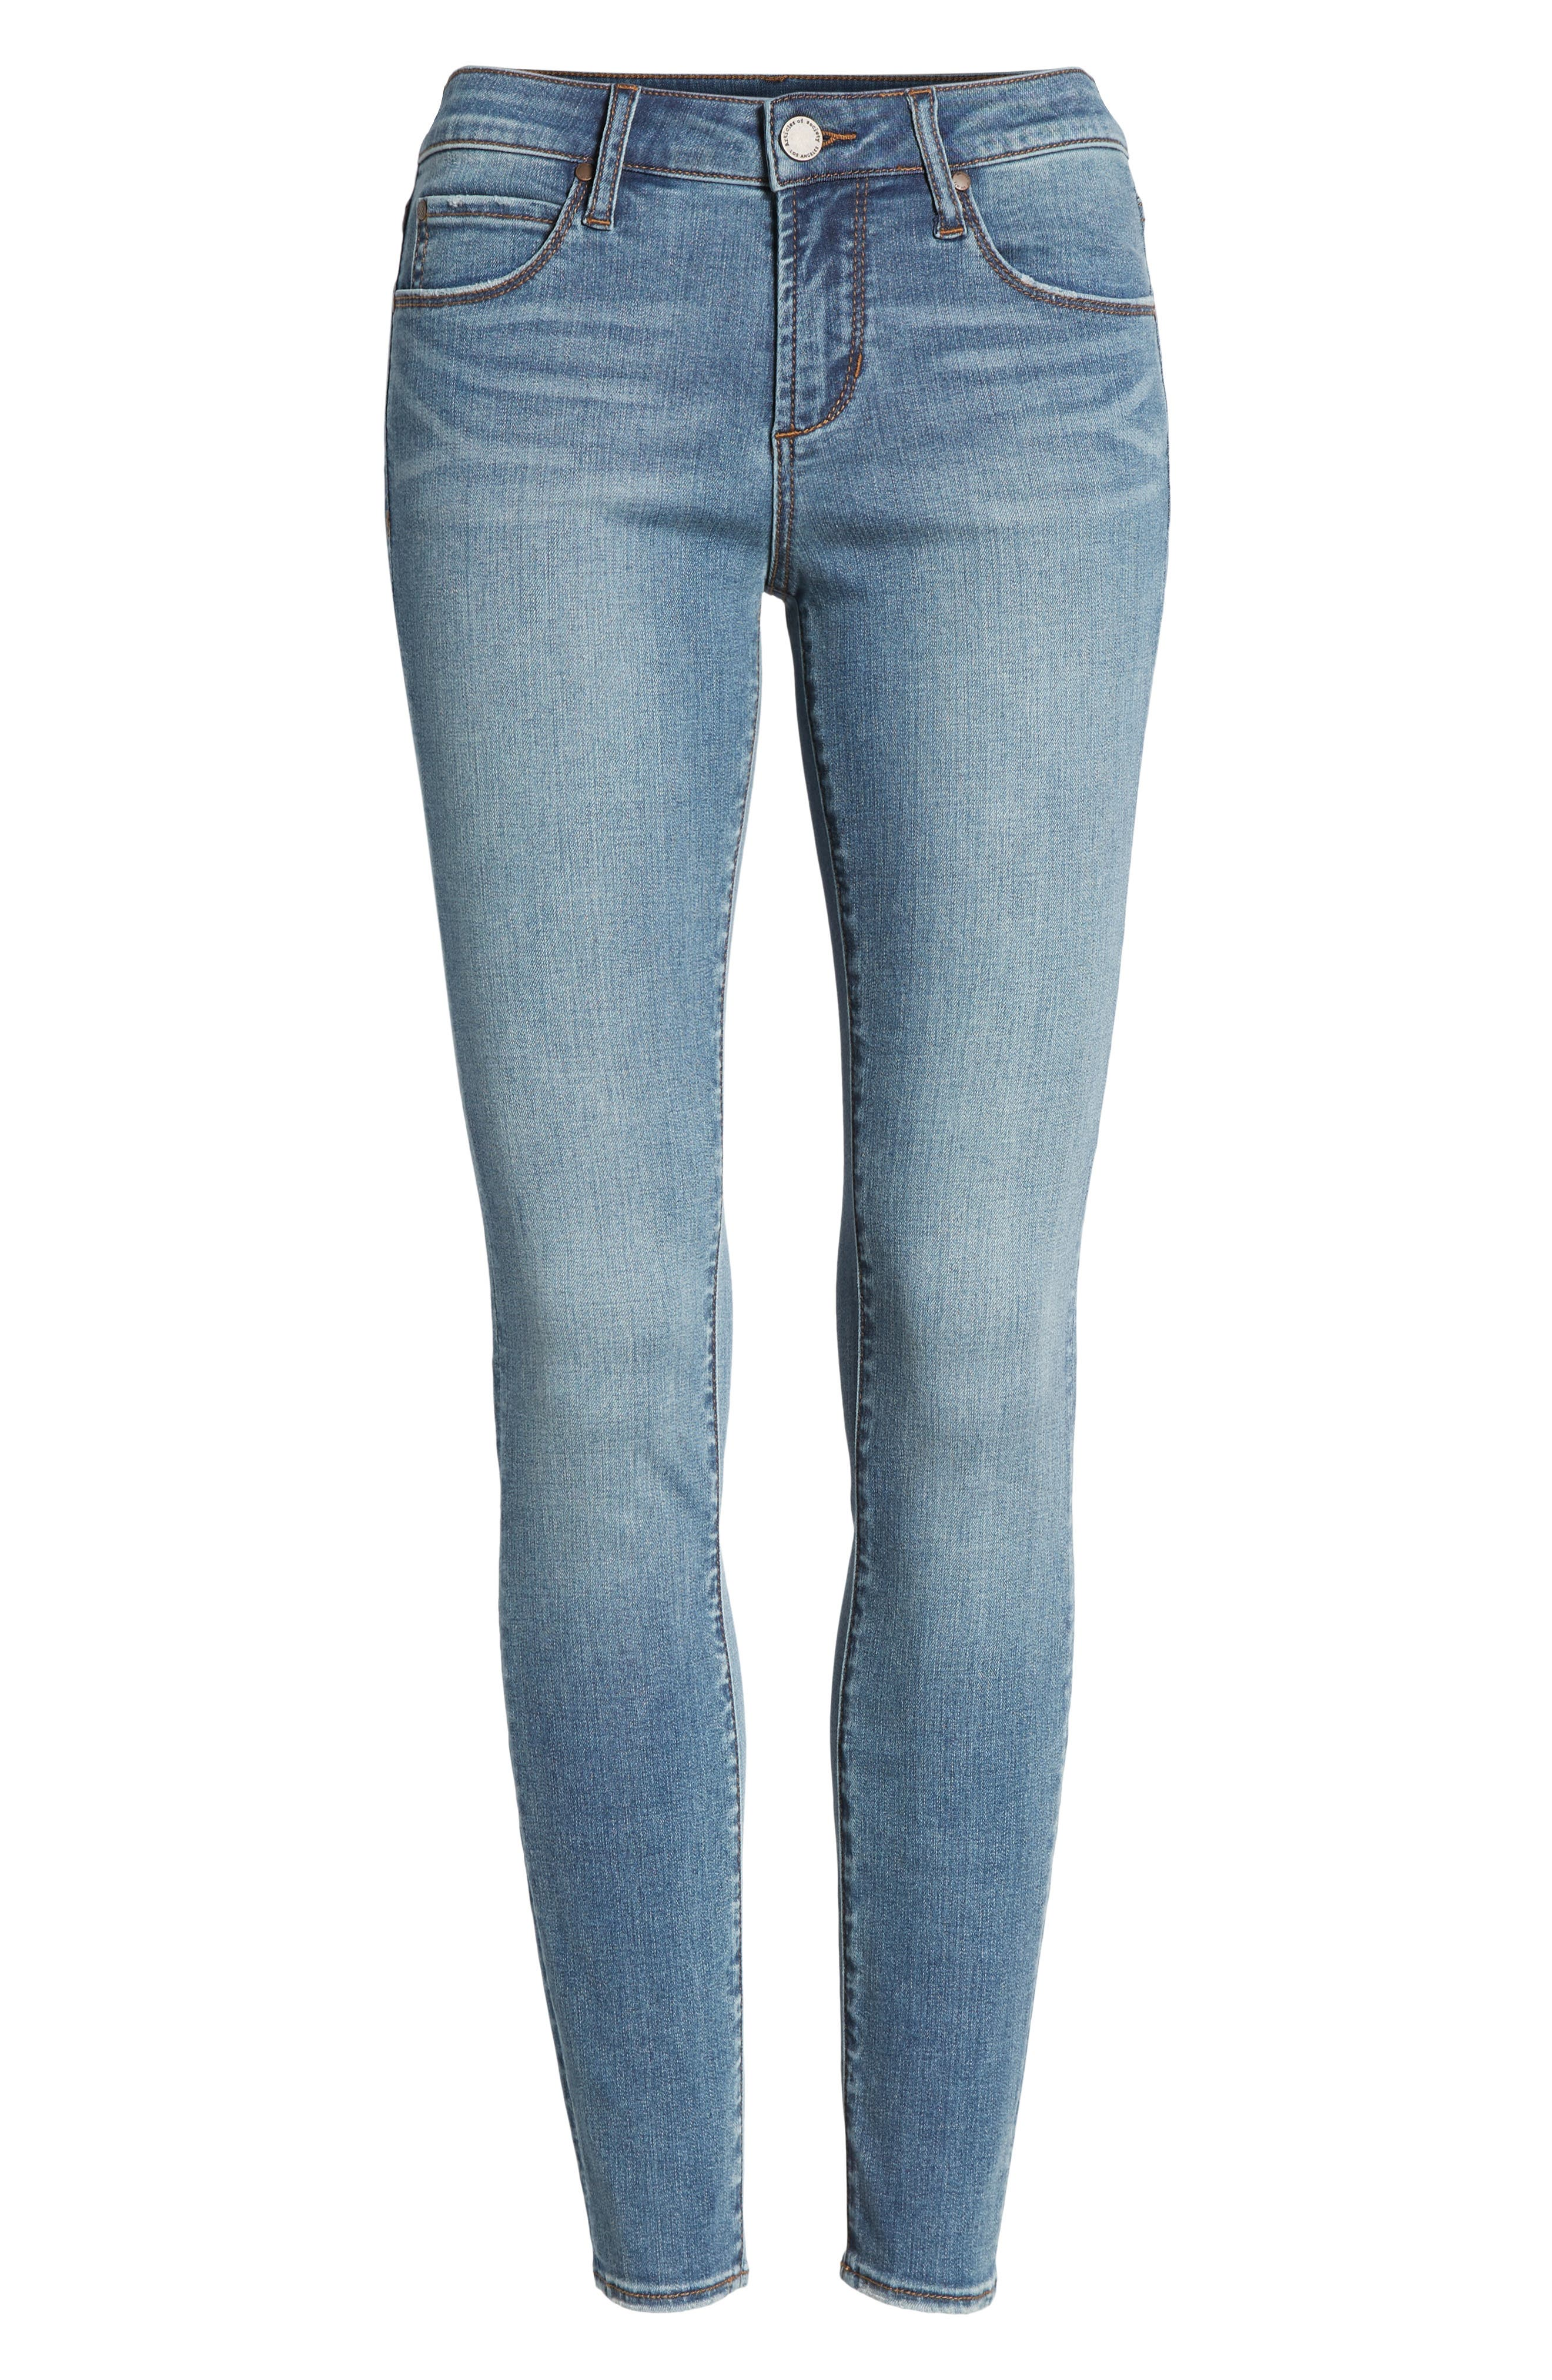 Sarah Skinny Jeans,                             Alternate thumbnail 7, color,                             400